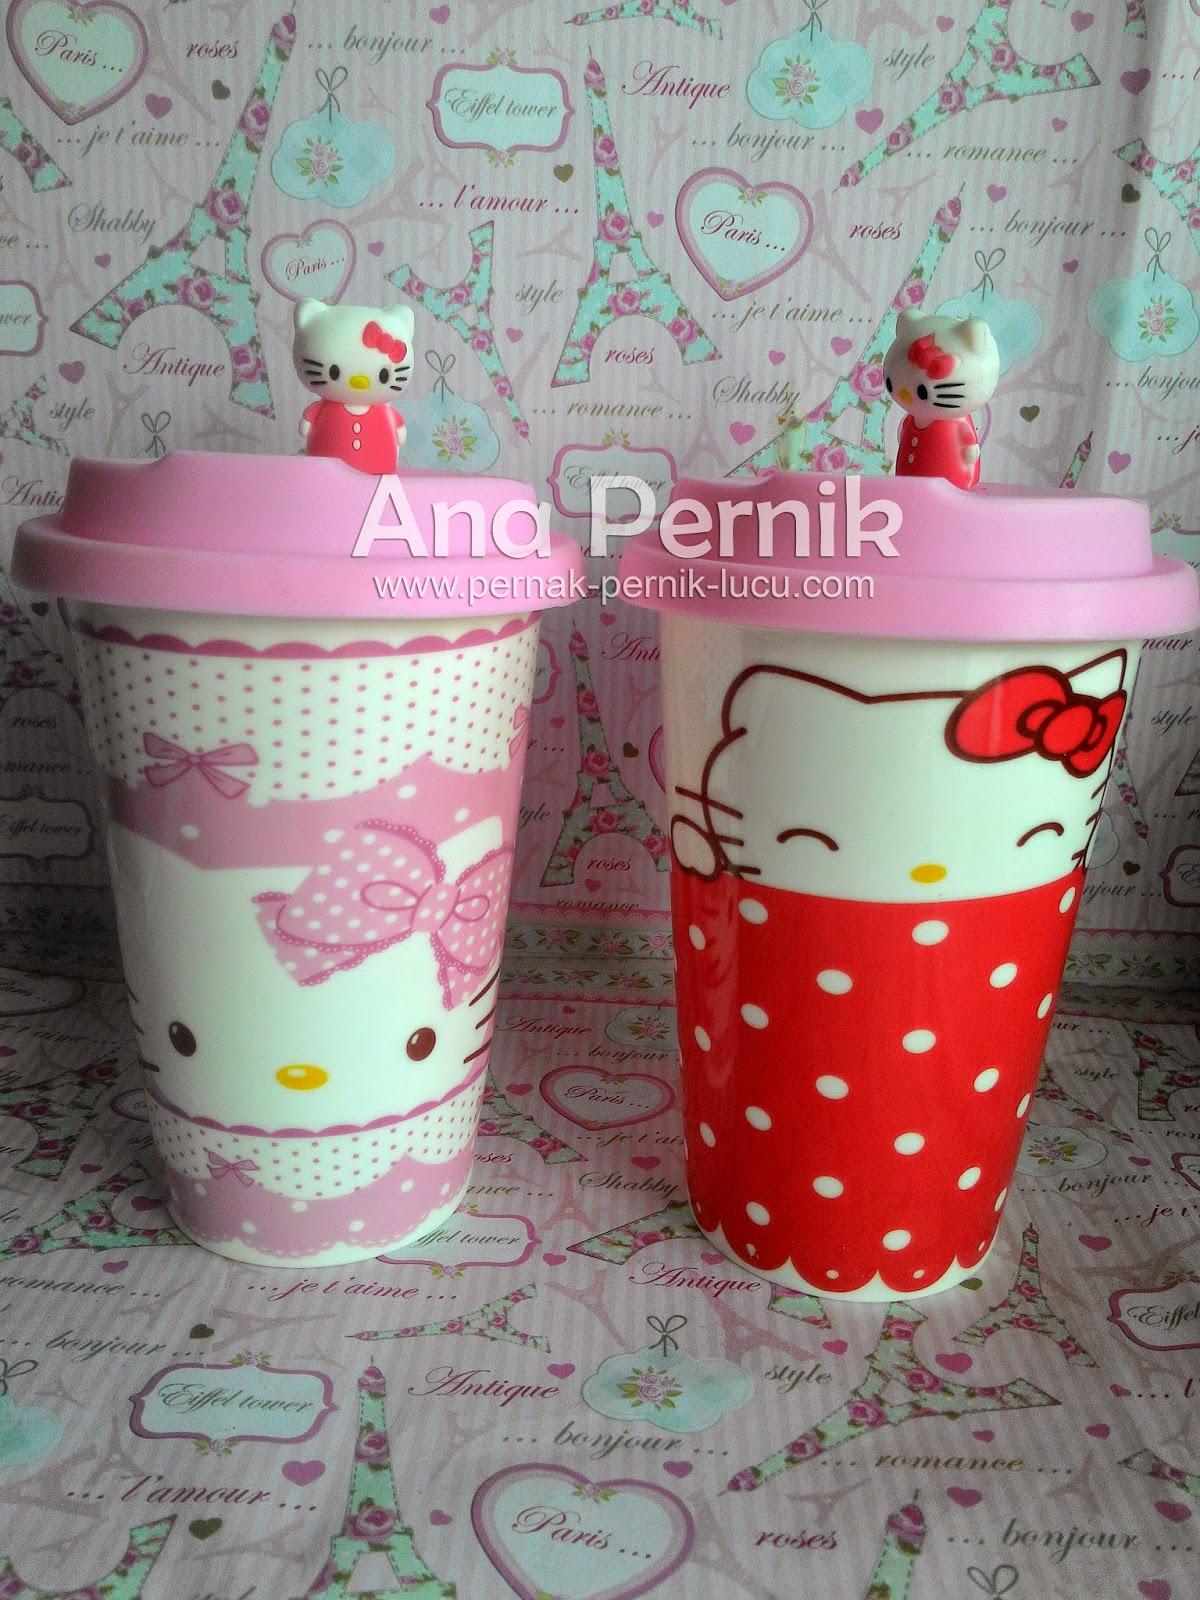 gelas hello kitty; gelas keramik; mug keramik; mug hello kitty; tableware hello kitty; peranotan hello kitty; pernak pernik; pernak pernik hello kitty; perlatan minum hello kitty